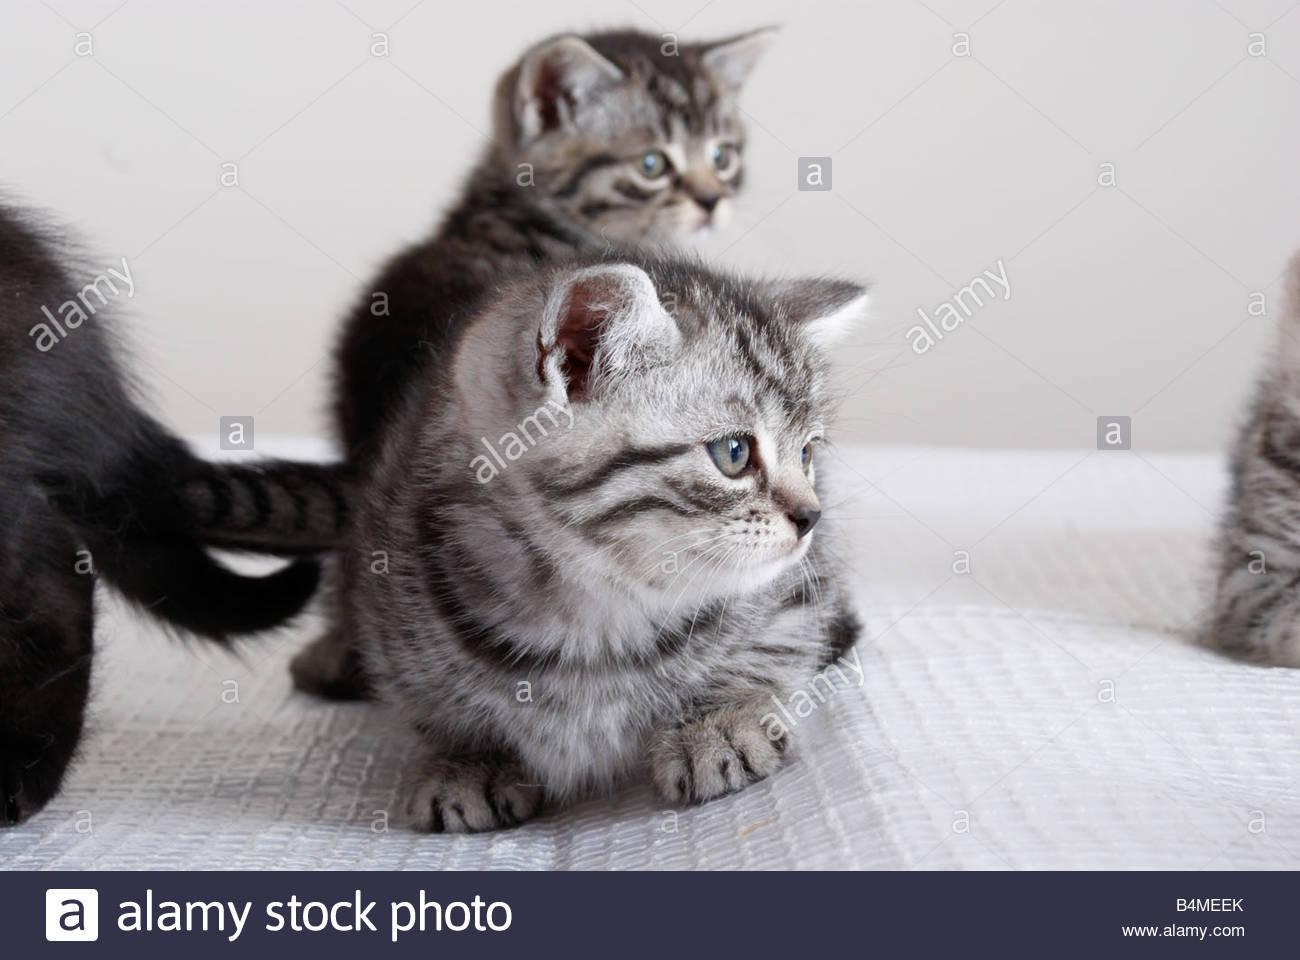 crouching kittens (hidden tiger). - Stock Image